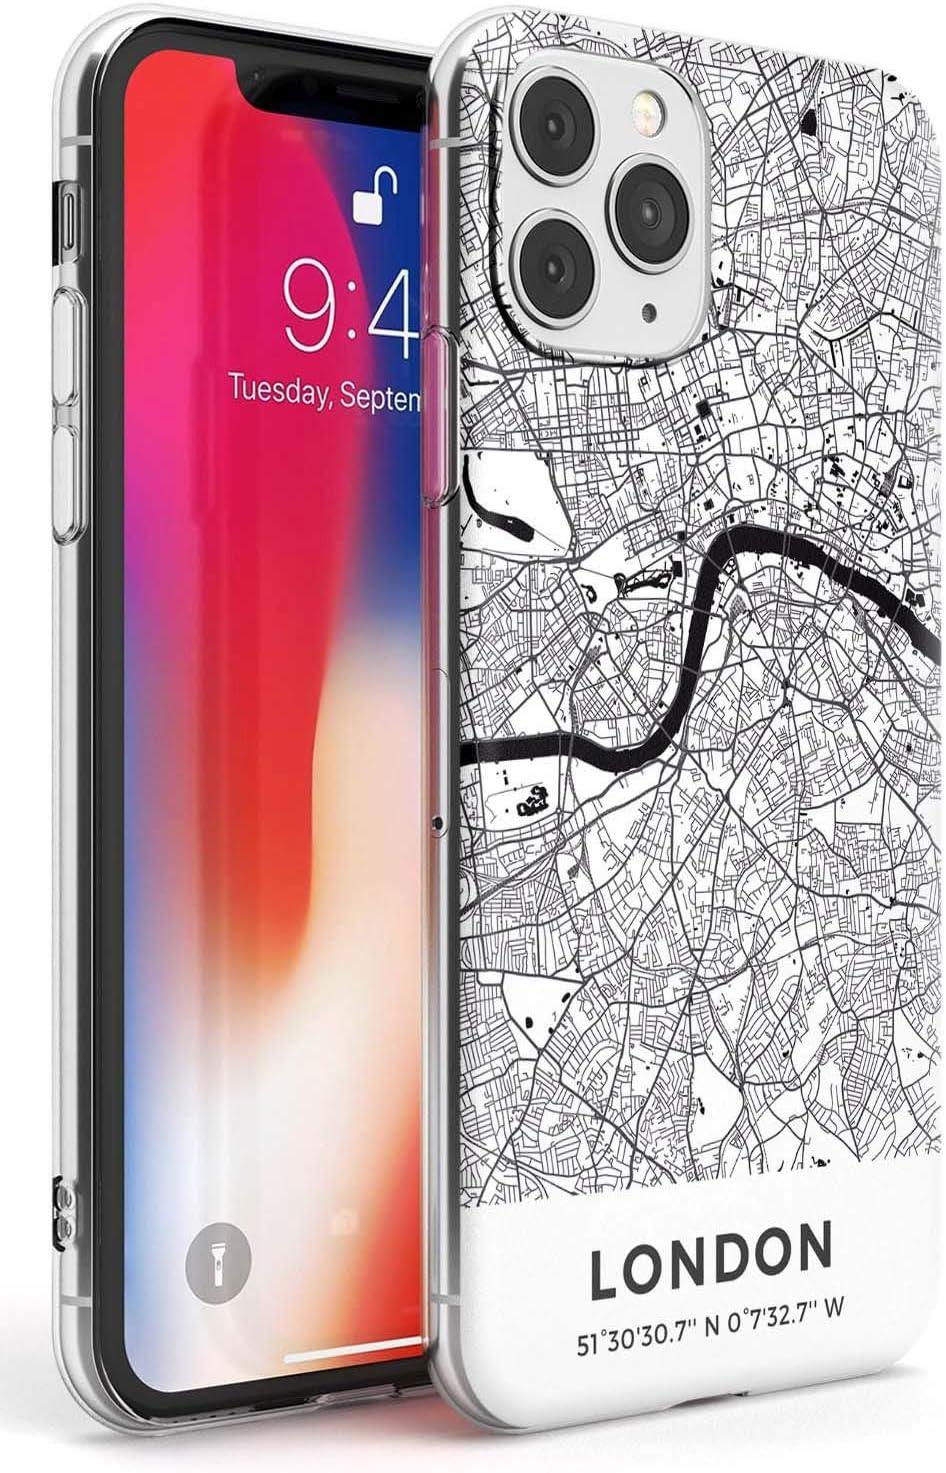 Mapa De Londres, Reino Unido Estuche Delgado para iPhone 11 Pro   Claro Silicona TPU Protector Ligero Ultra Thin Cubrir Modelo Impreso   Viaje Inglaterra Pasión De Viajar Capital Europa: Amazon.es: Electrónica